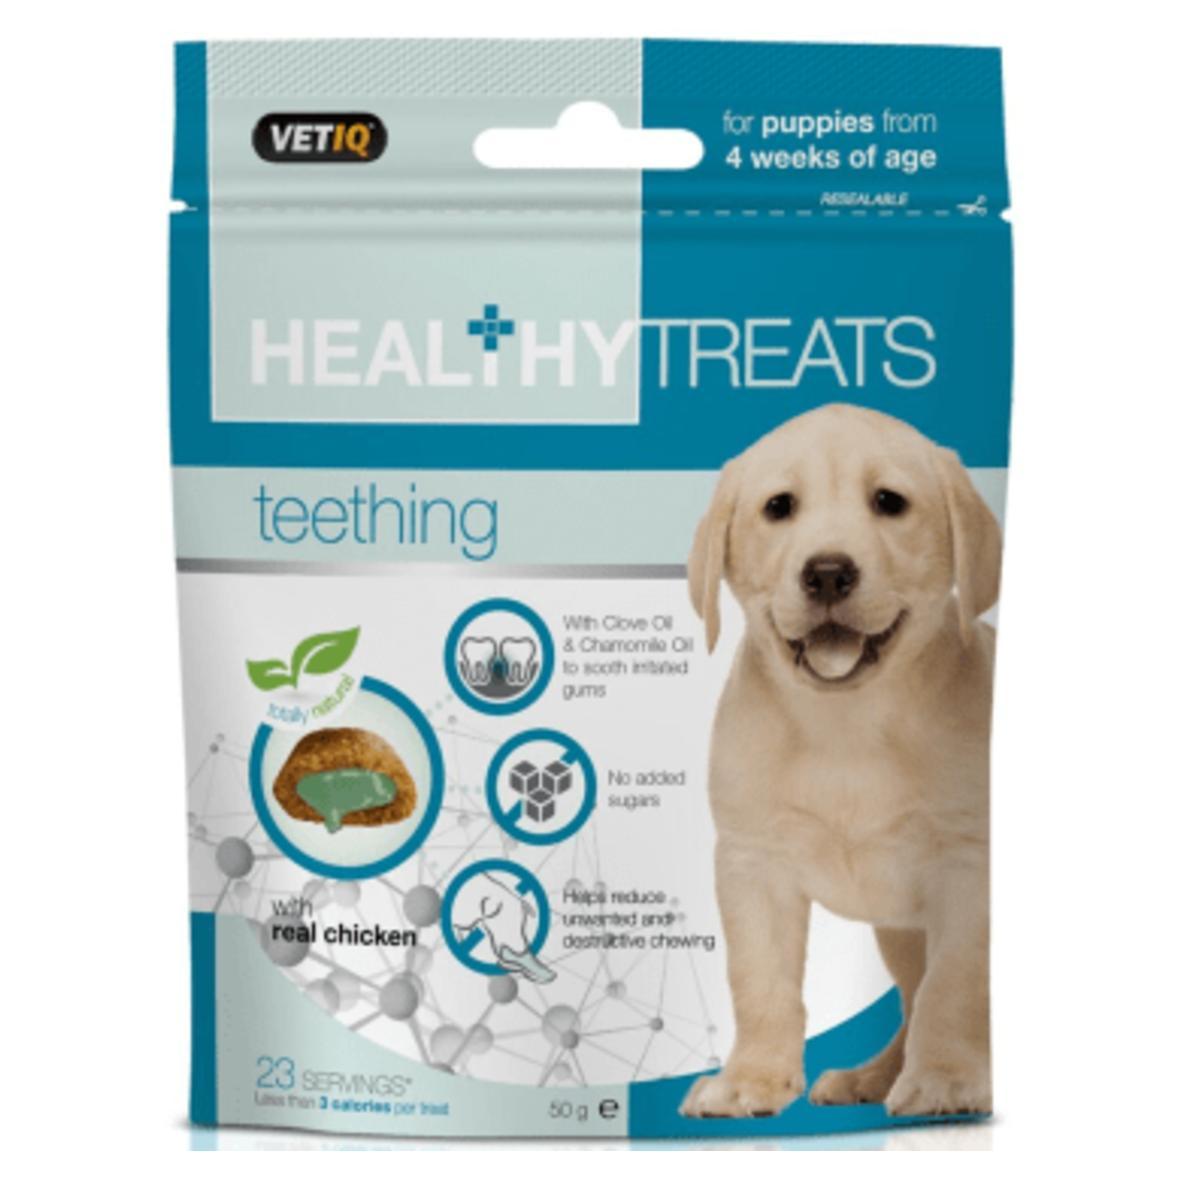 CLEARANCE VetIQ Healthy Treats Teething Treats for Puppies 50gm